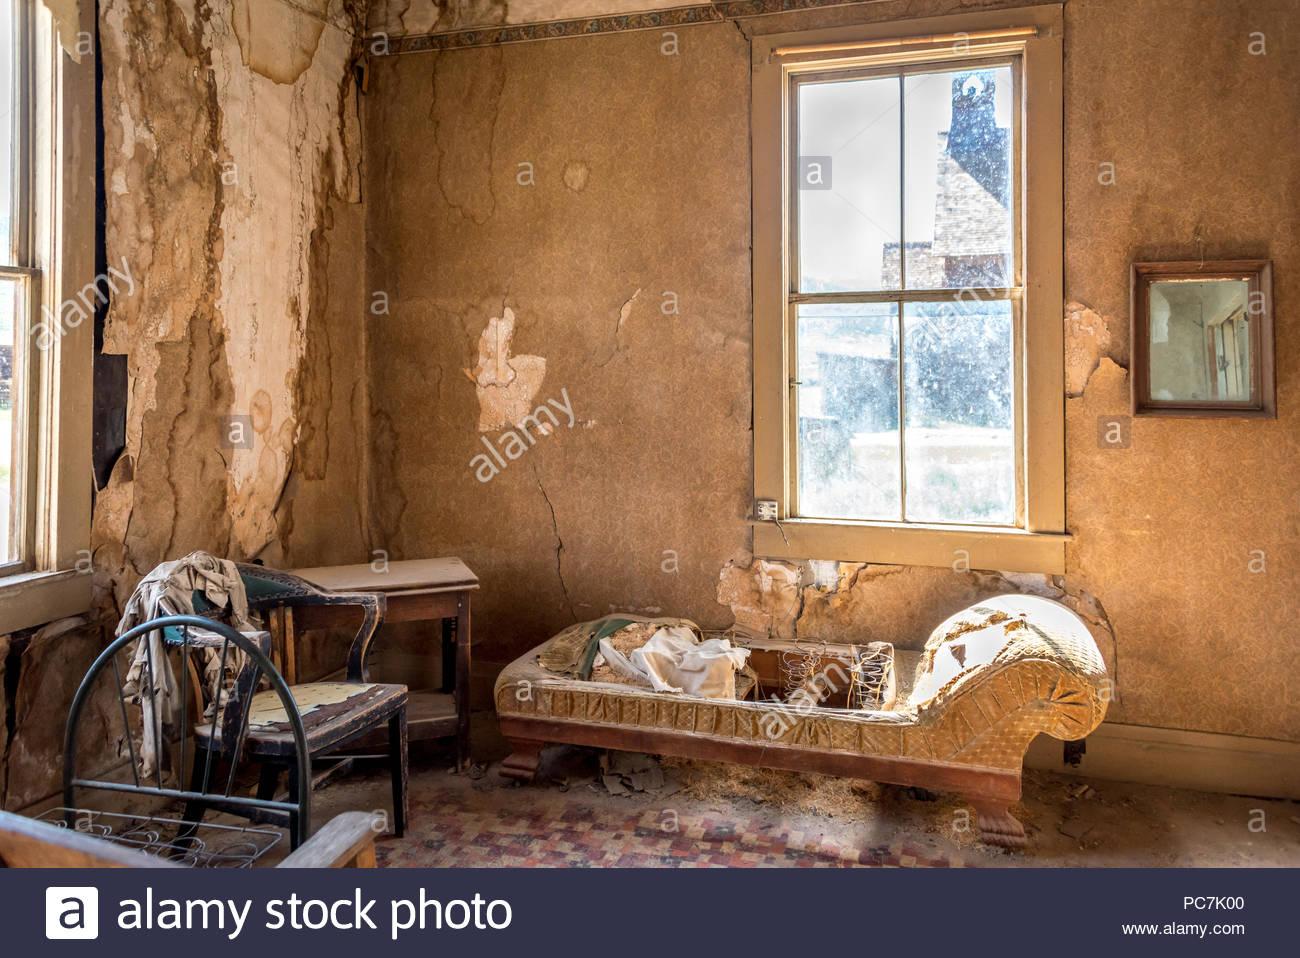 Interior of the Miller house w peeling wallpaper cracked plaster 1300x958